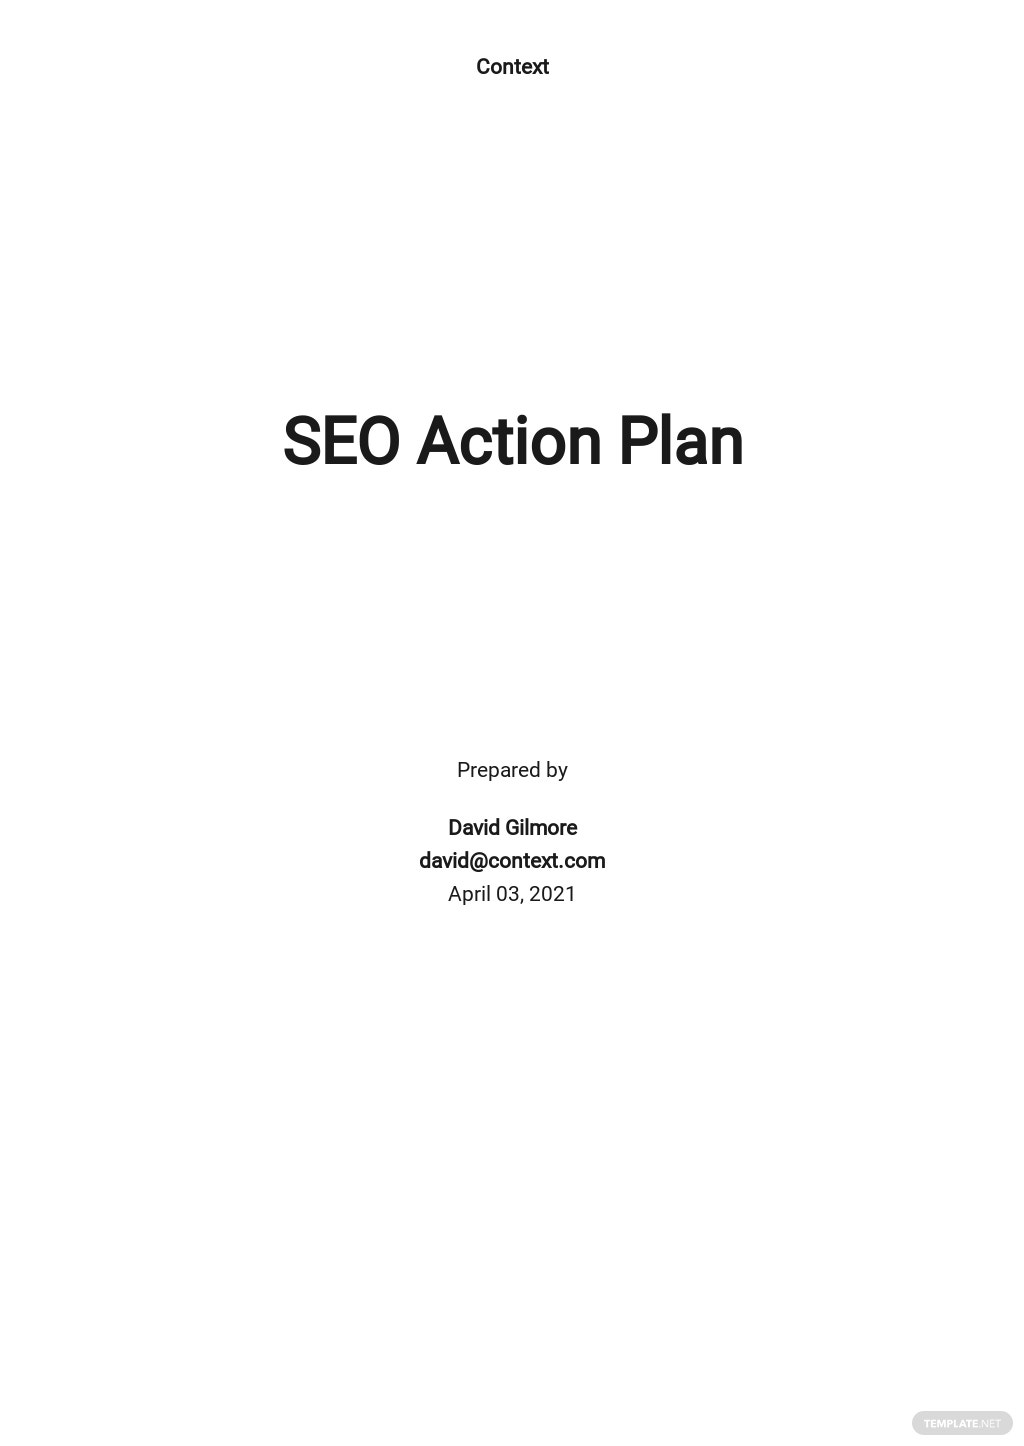 SEO Action Plan Template.jpe